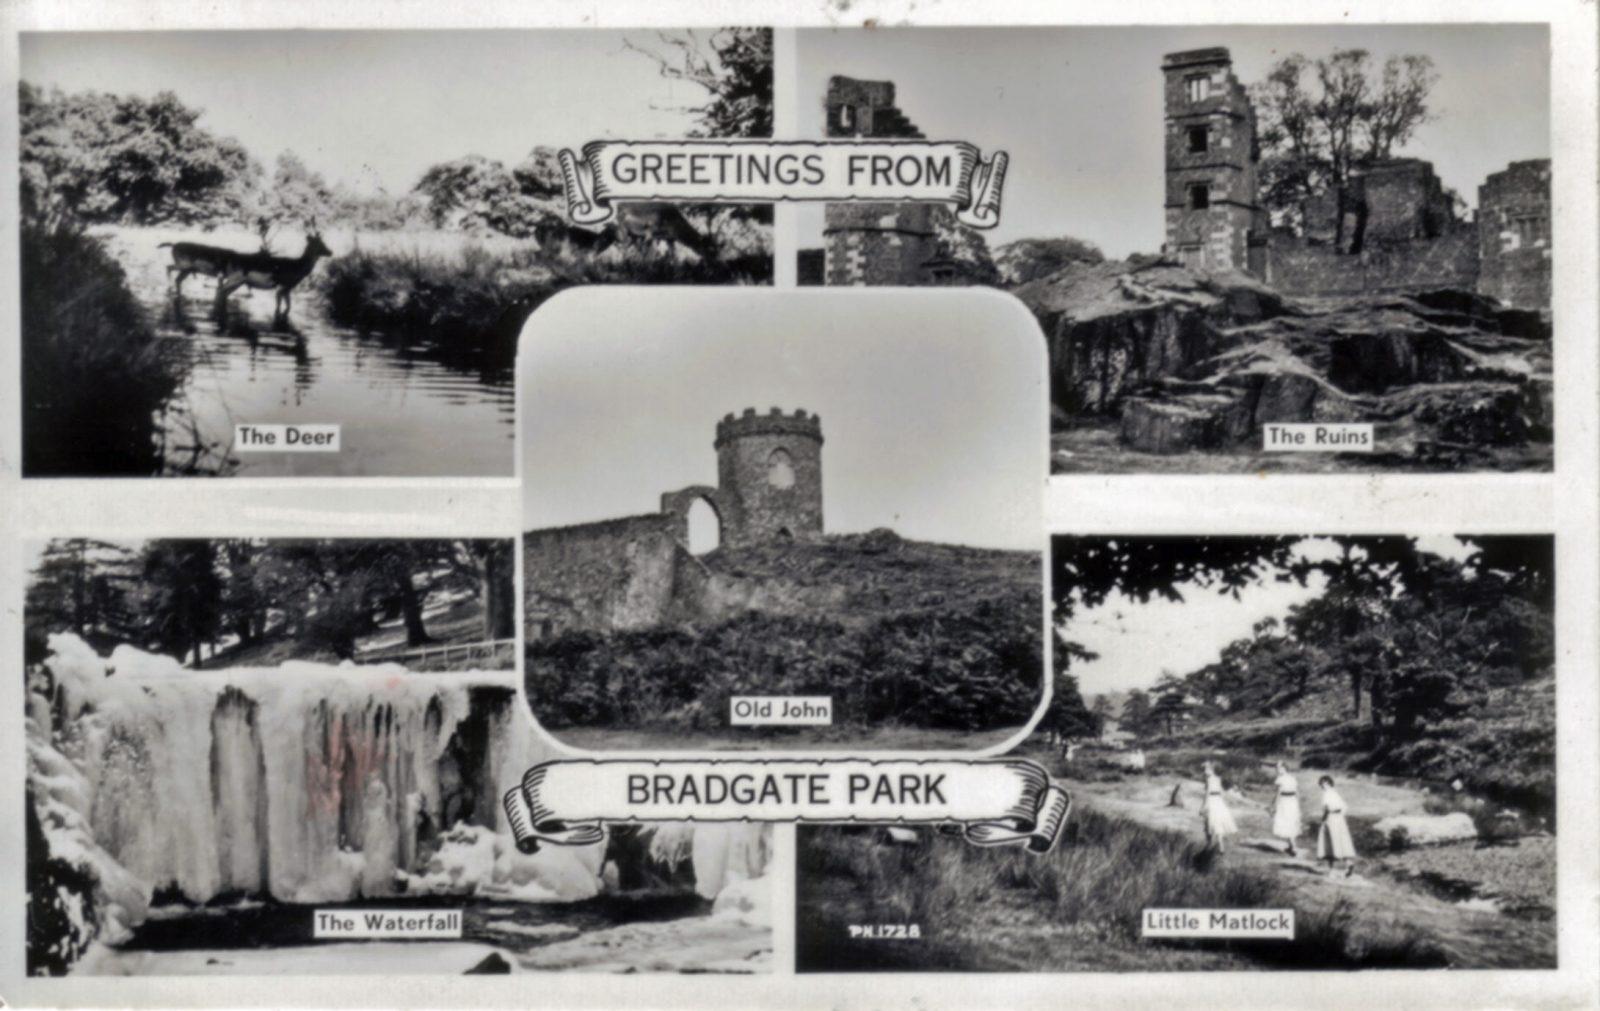 Bradgate Park, Leicester. 1941-1960: 5 views: deer, ruins, waterfall, Old John, Little Matlock. (File:1308)